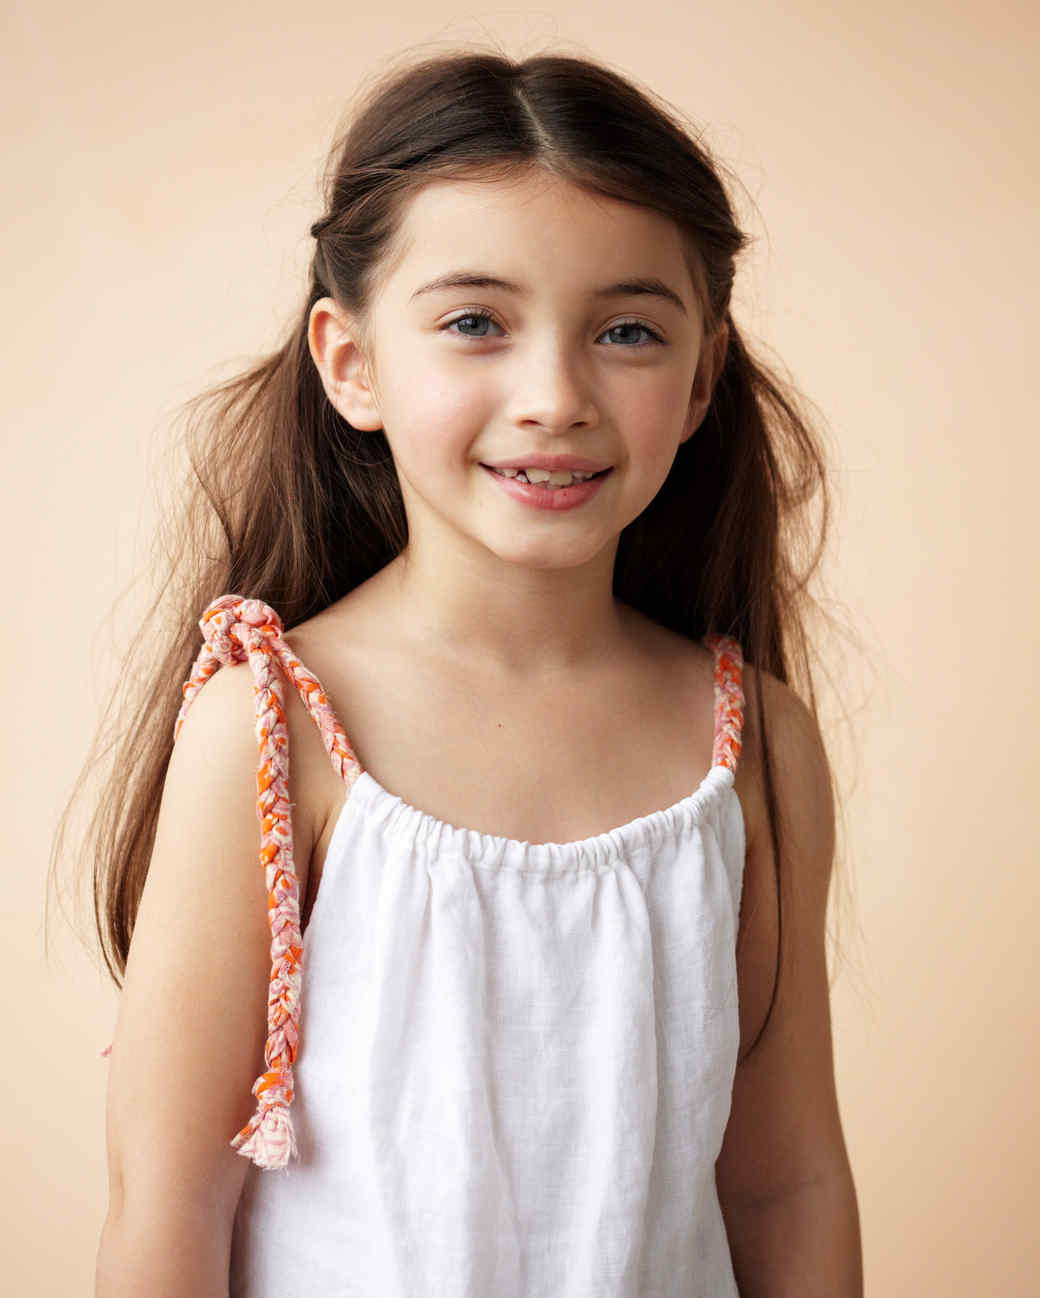 girl in braided dress